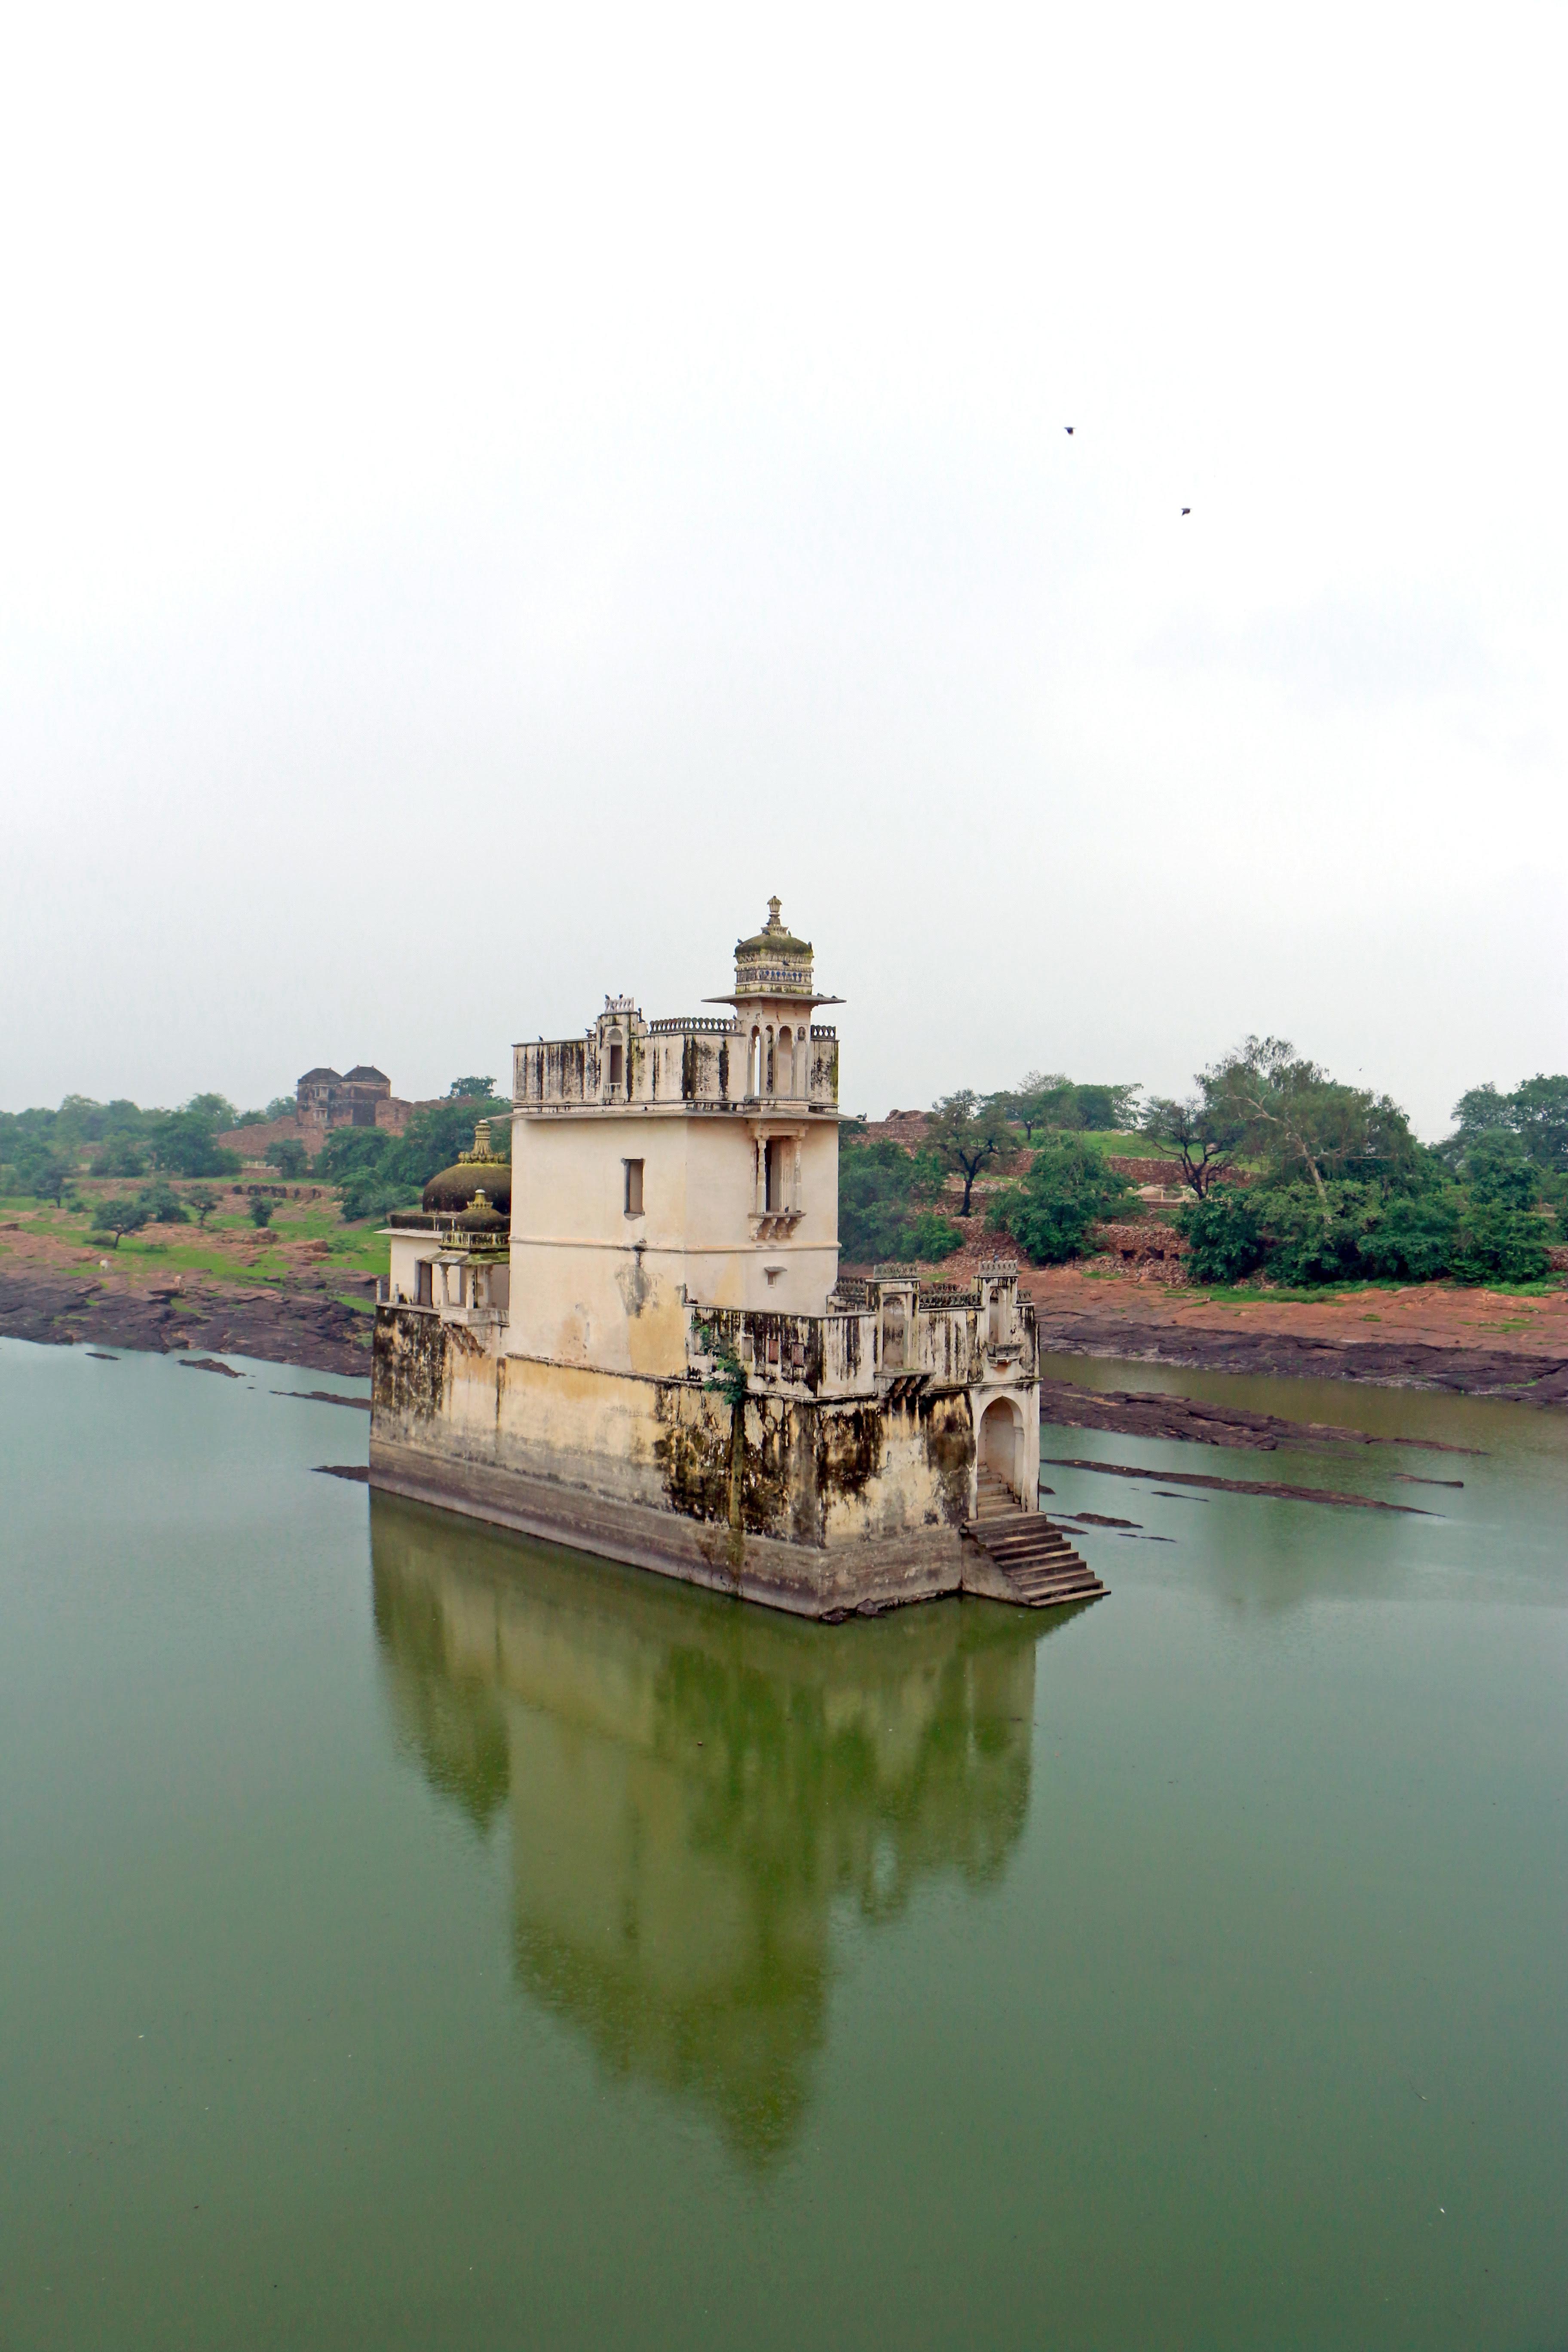 File:Rani Padmini's palace.jpg